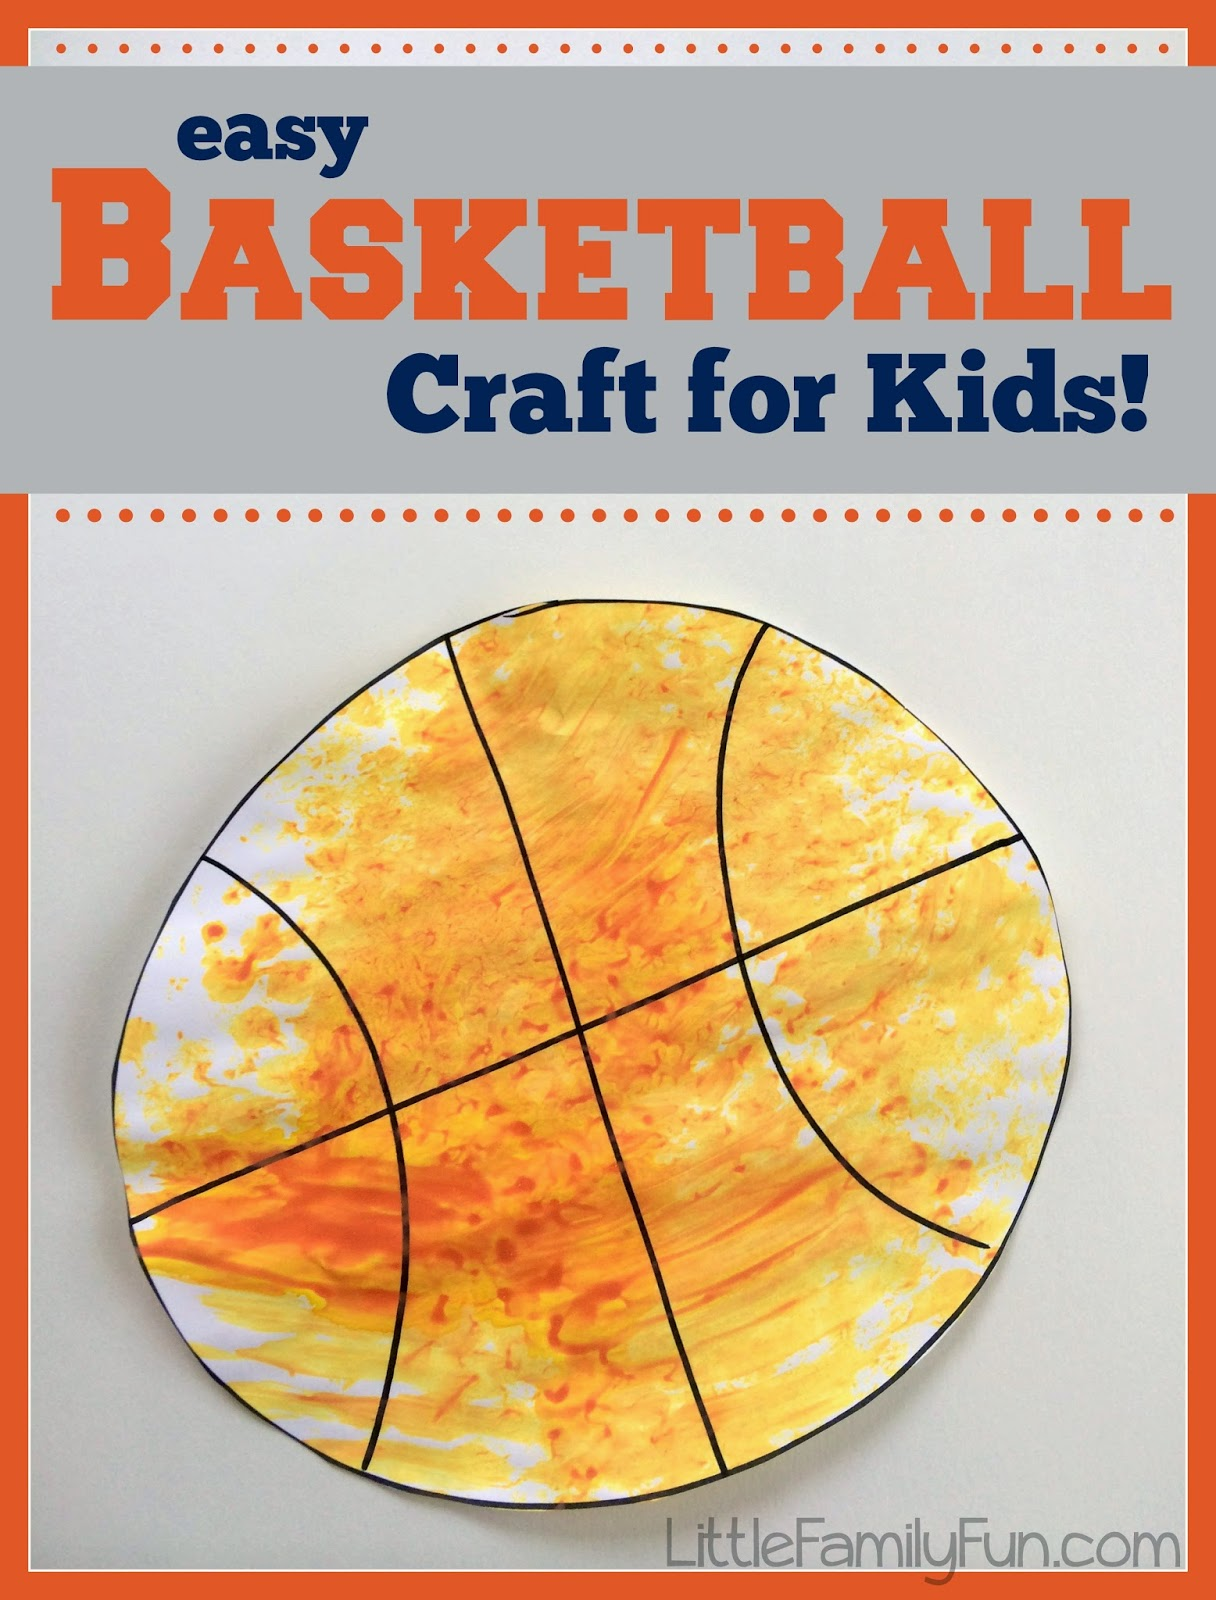 Basketball craft for kids for Crafts for little kids